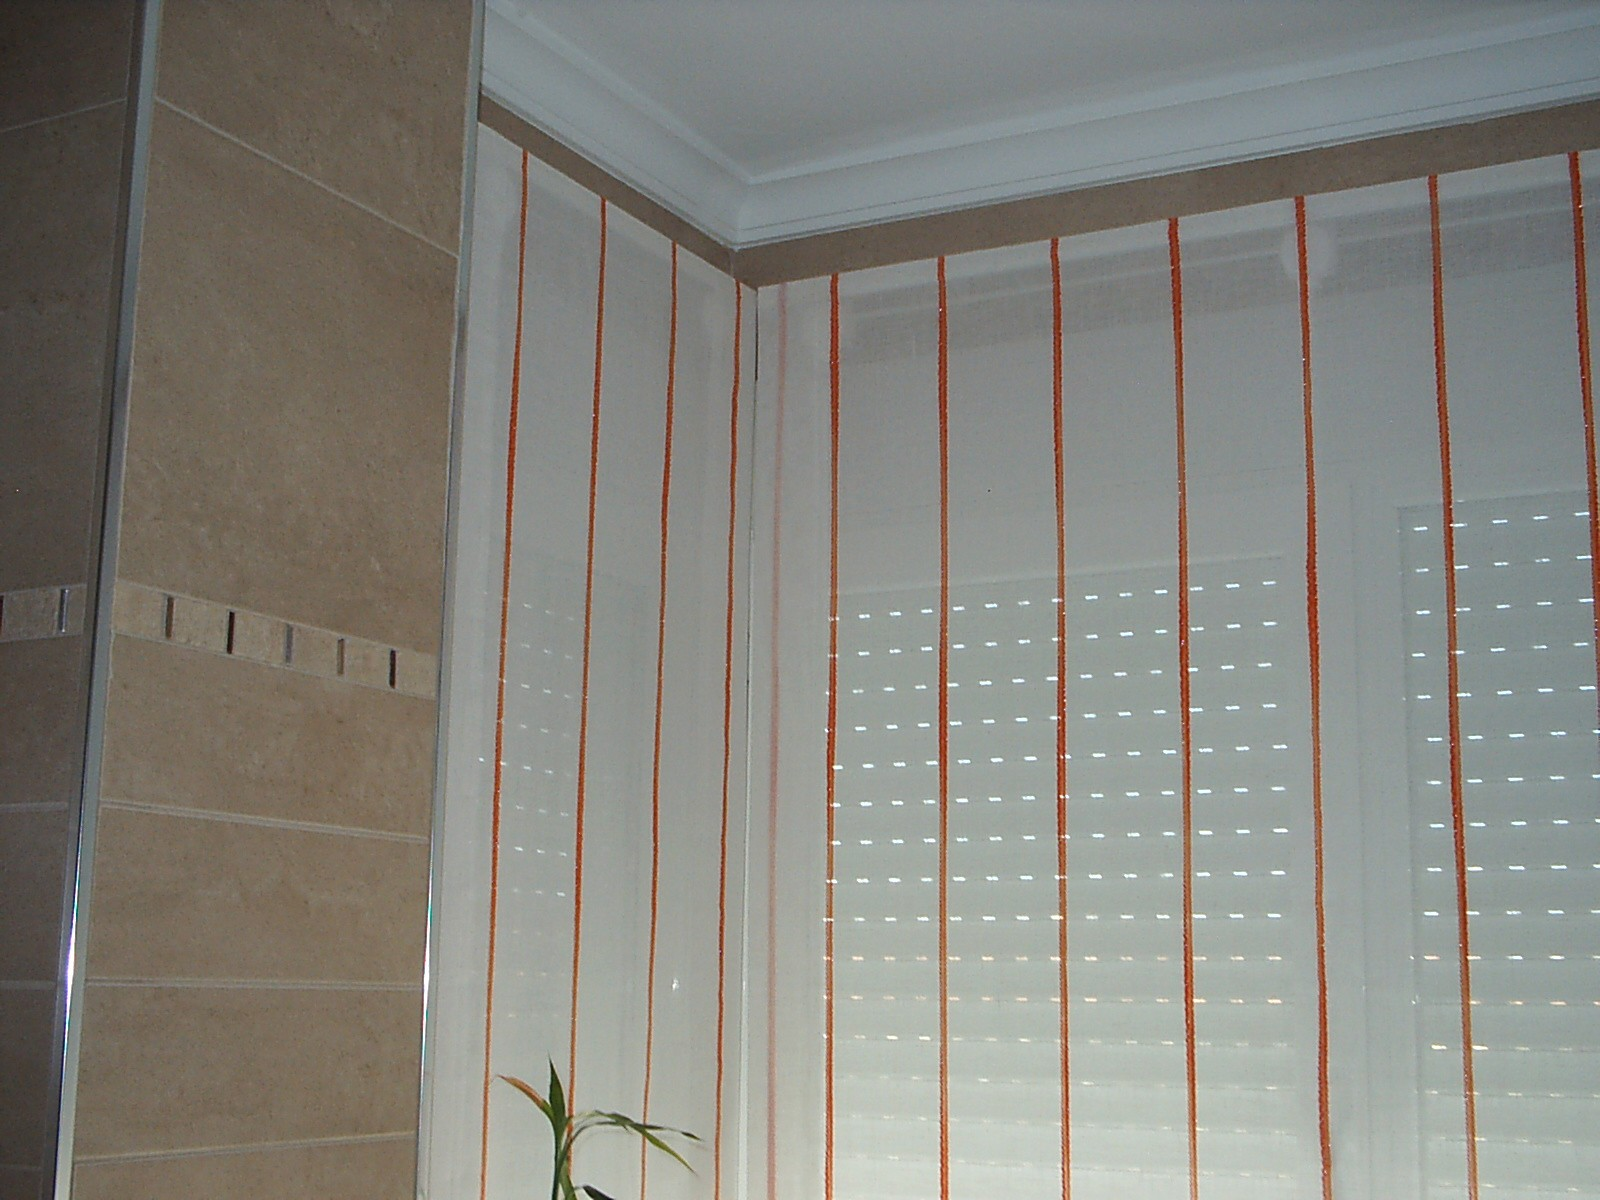 Dormitorio muebles modernos cortinas para miradores - Cortinas para miradores ...